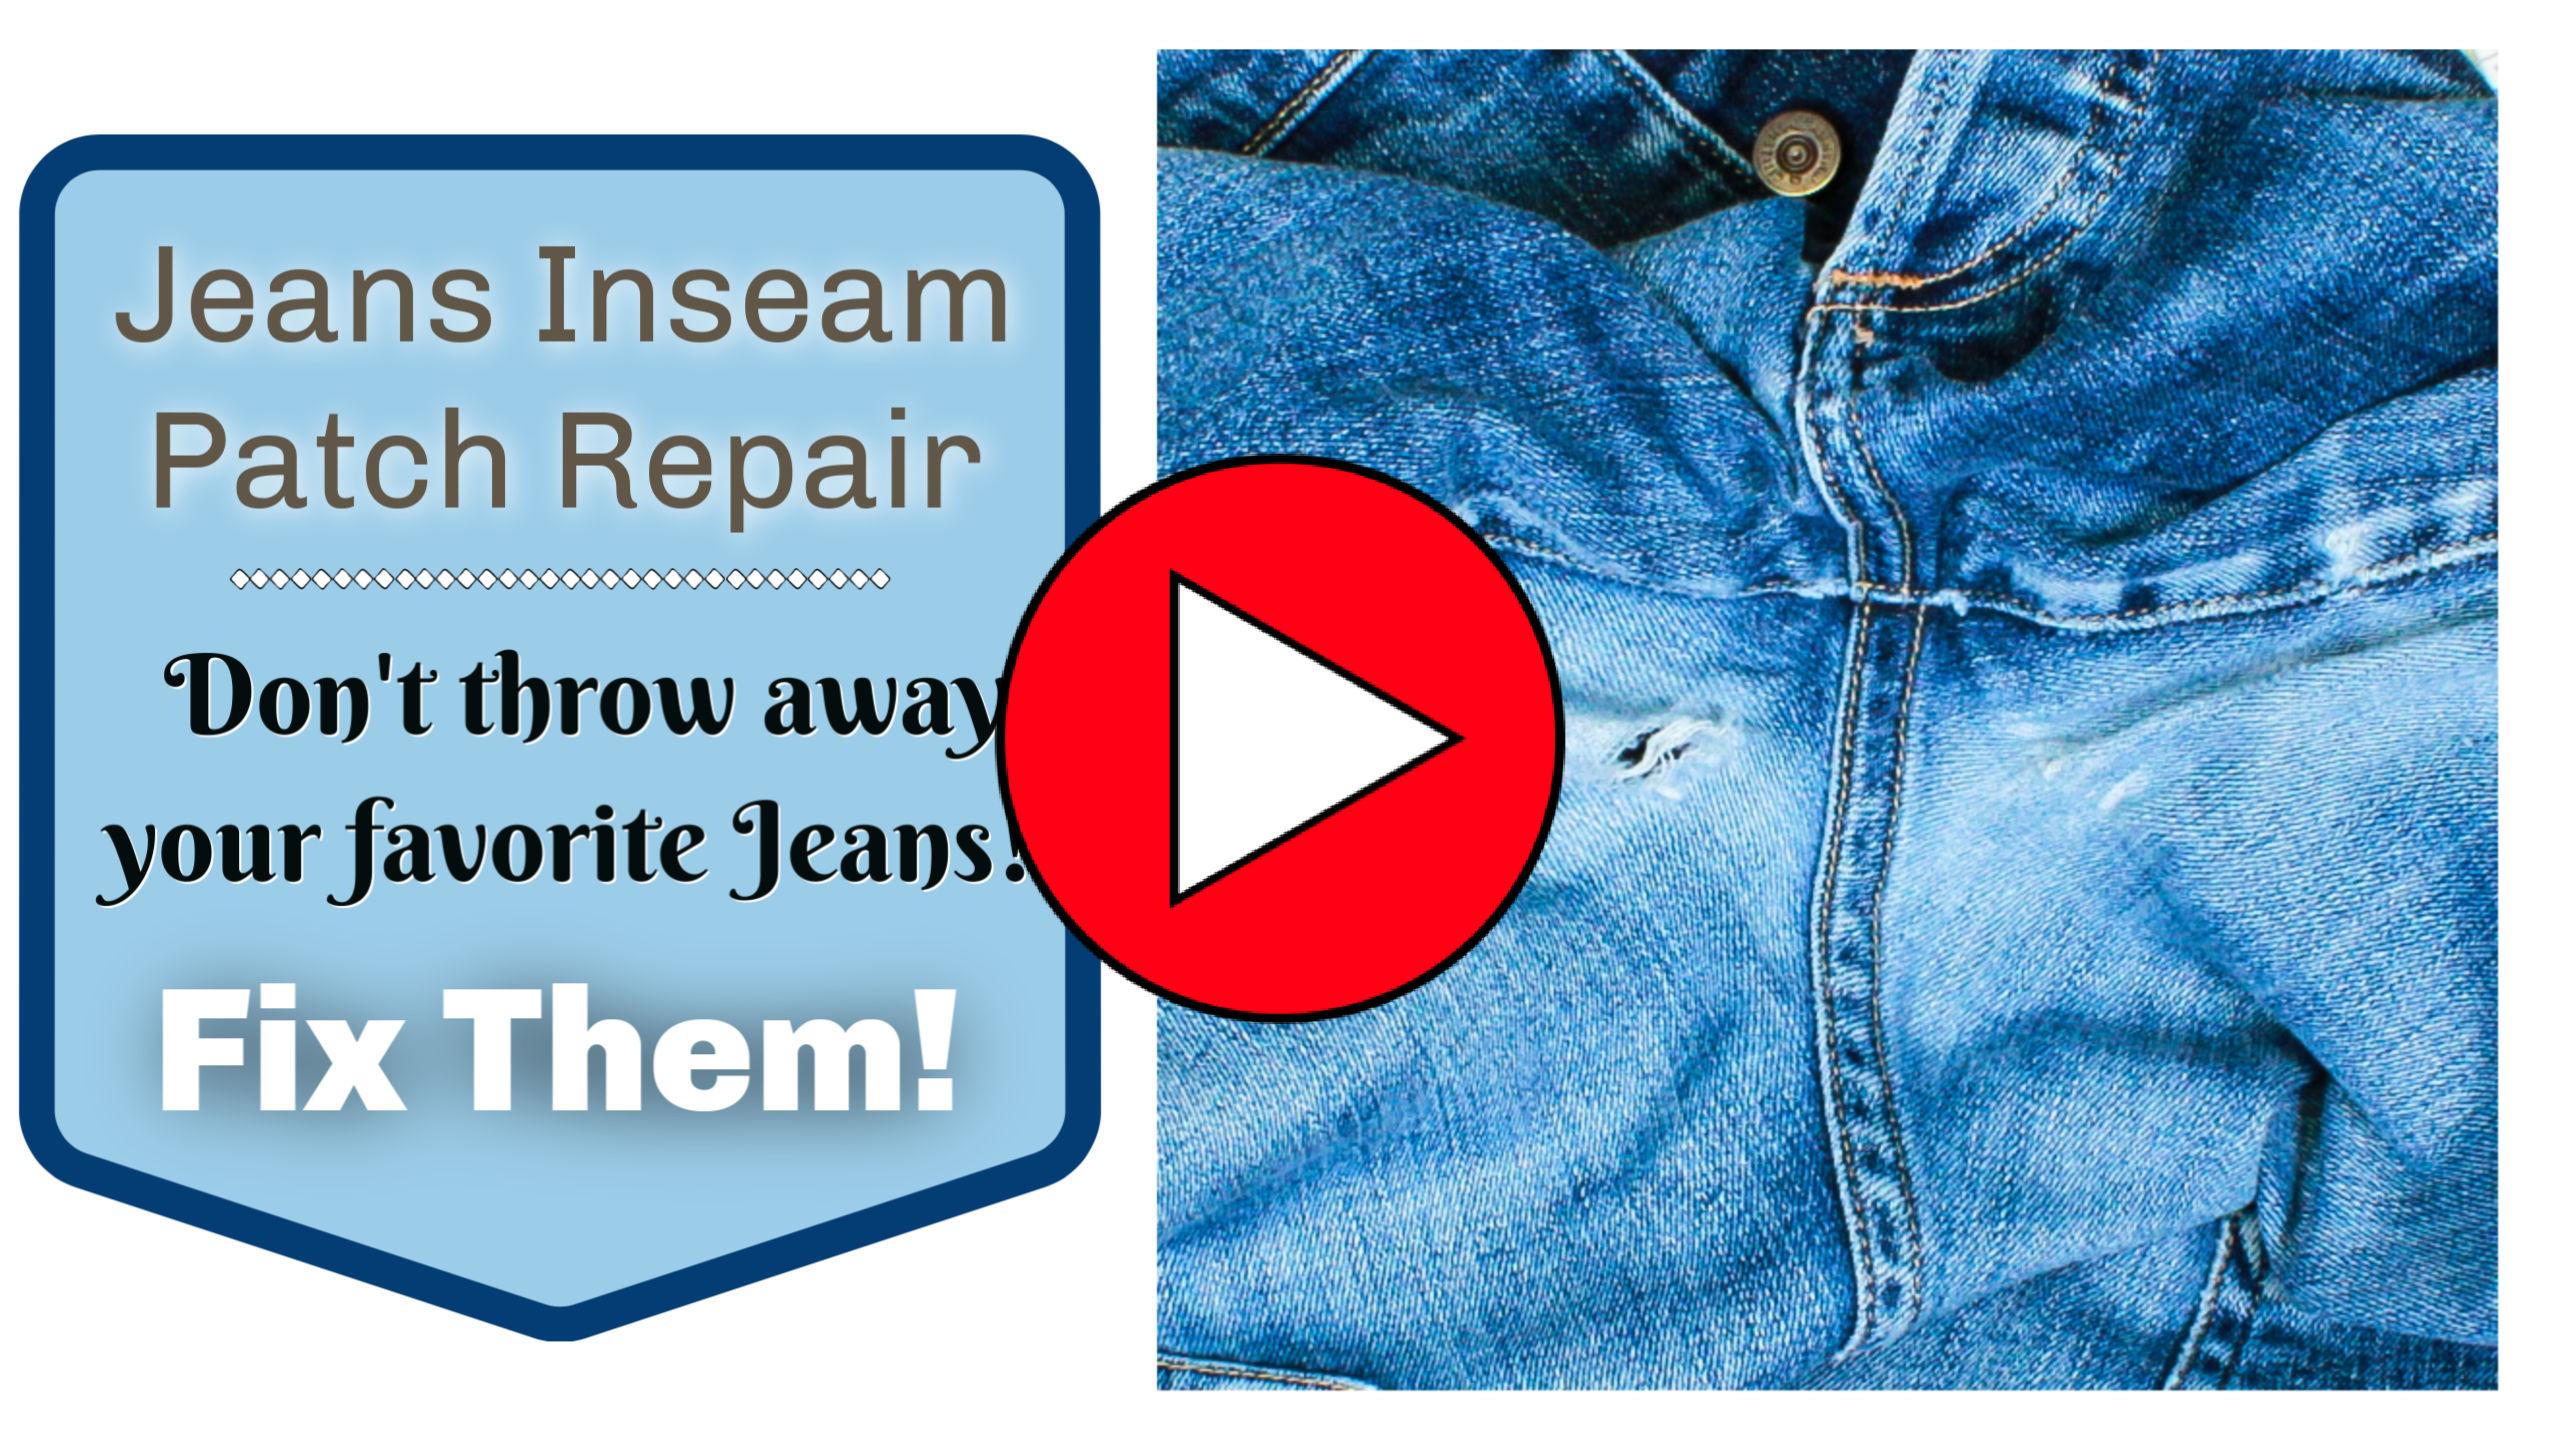 Diy Jeans Inseam Patch Repair Sew Much Moore